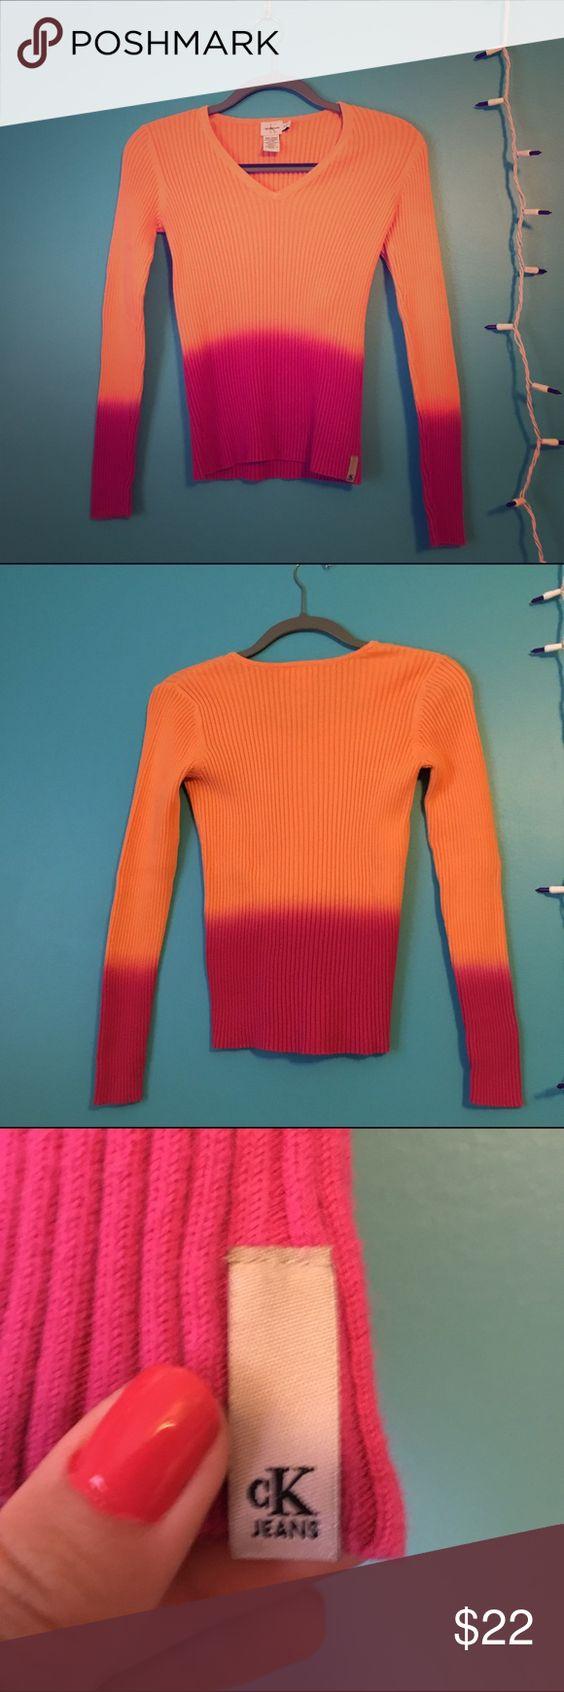 Calvin Klein dip dye sweater Size S, authentic CK, great condition Calvin Klein Sweaters V-Necks